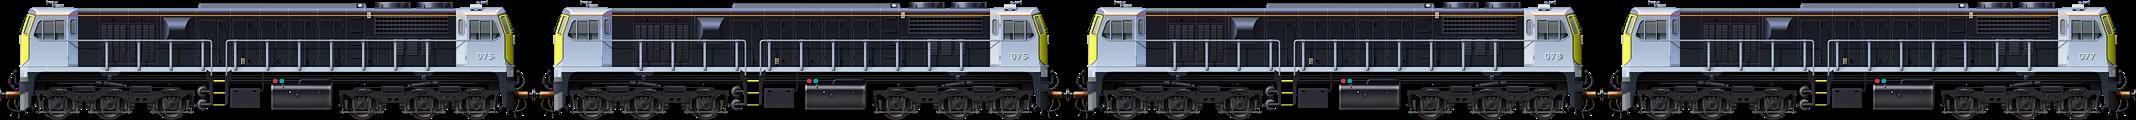 071 Class Cargo I